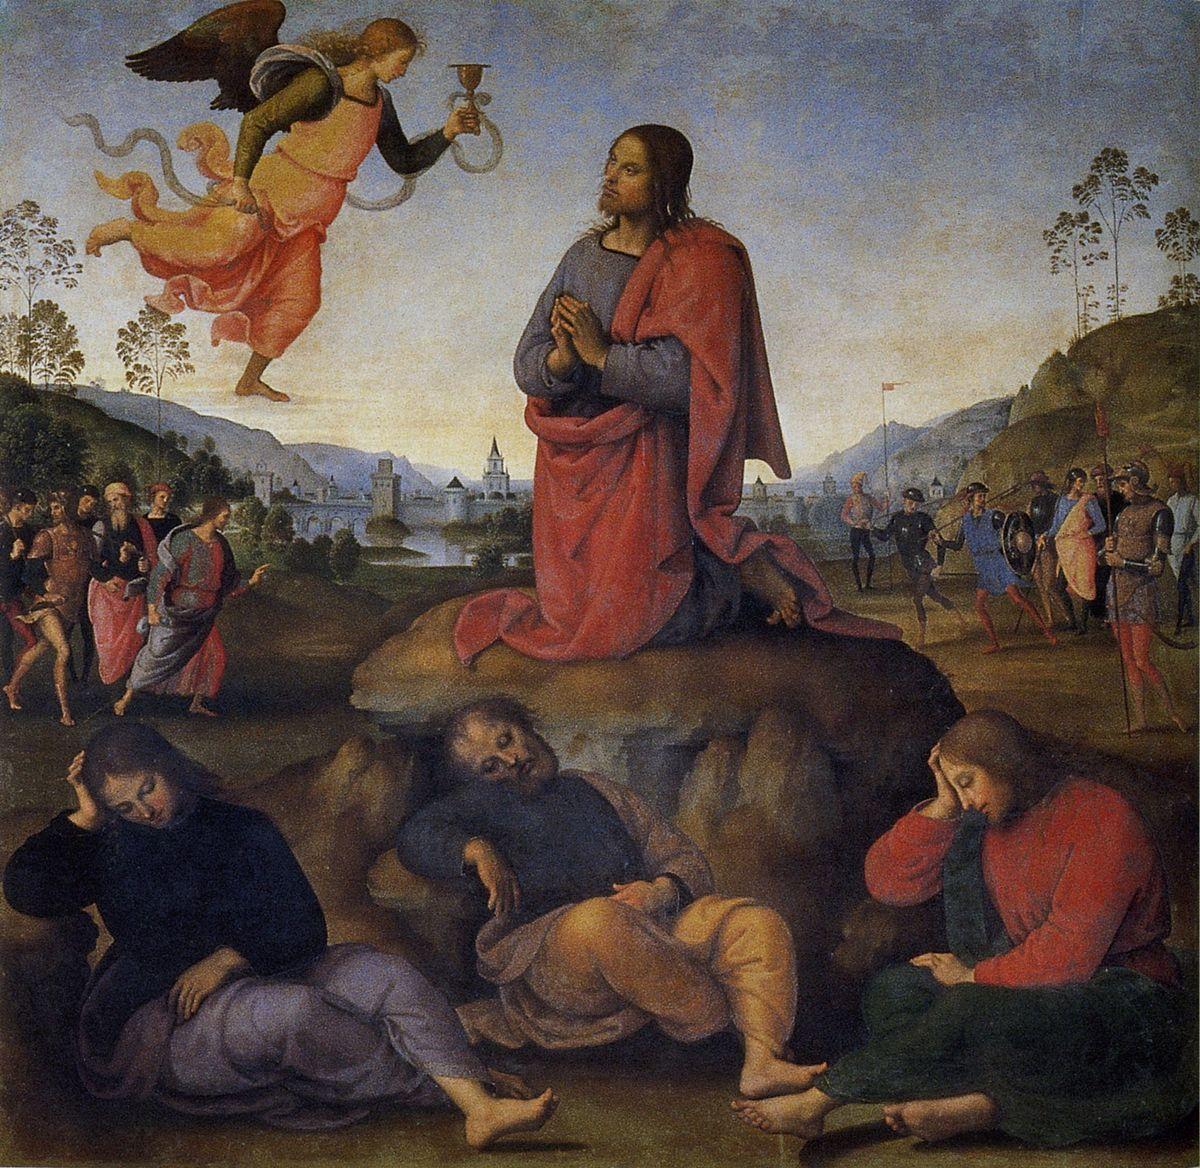 The Landscape Gardener: Agony In The Garden (Perugino)